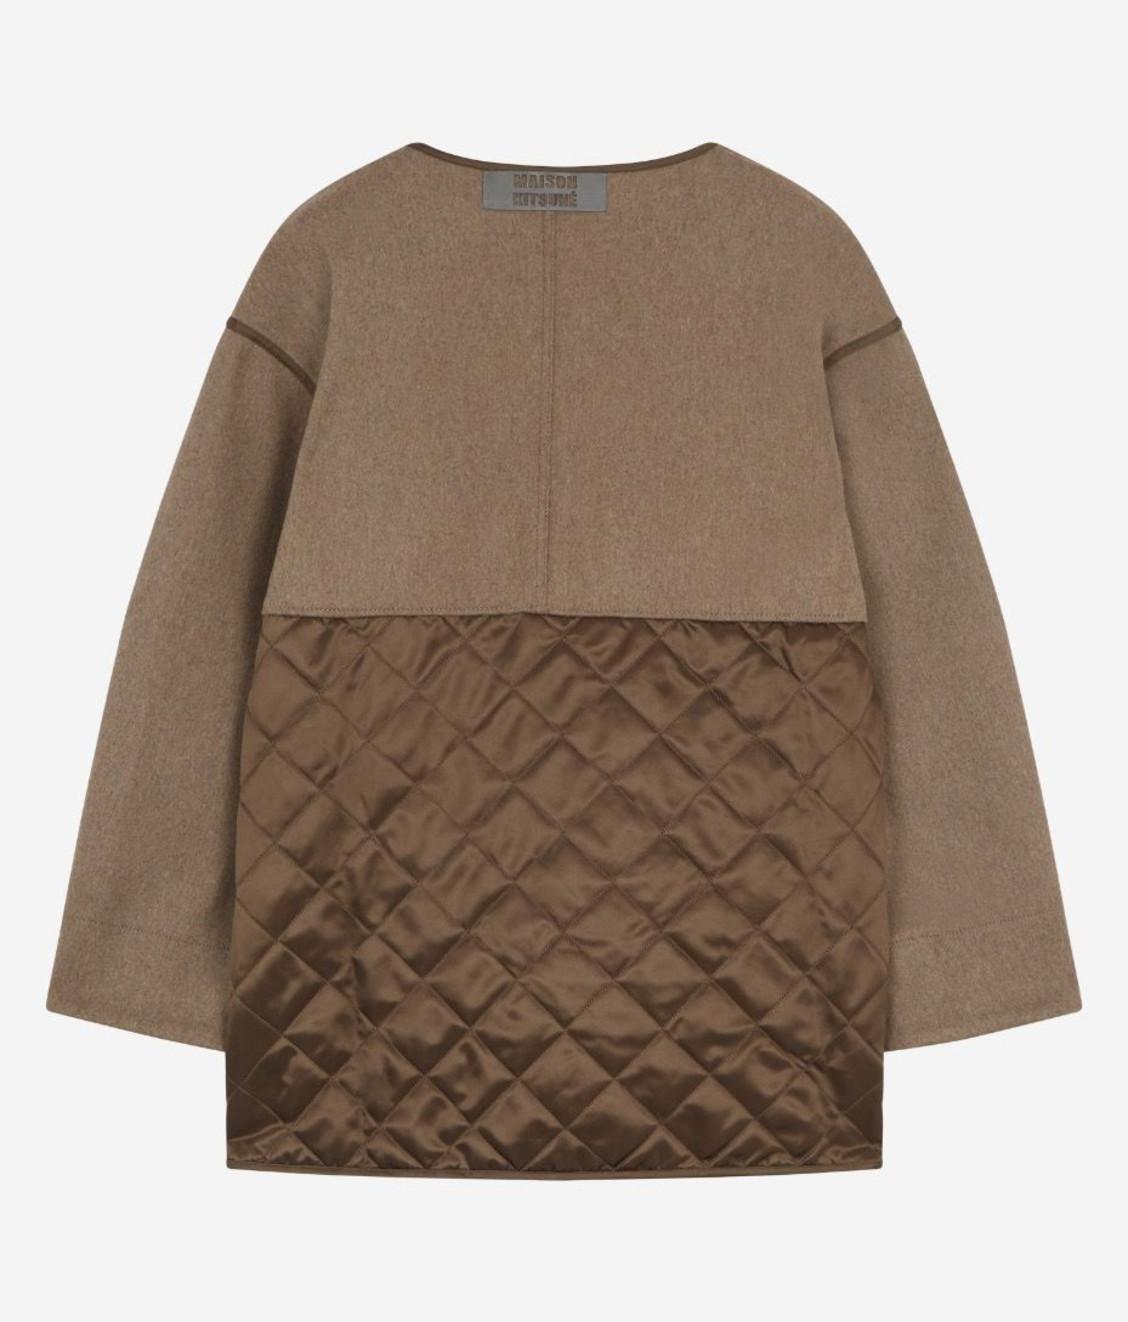 Maison Kitsune Kitsune Quilted Jacket Beige Brown